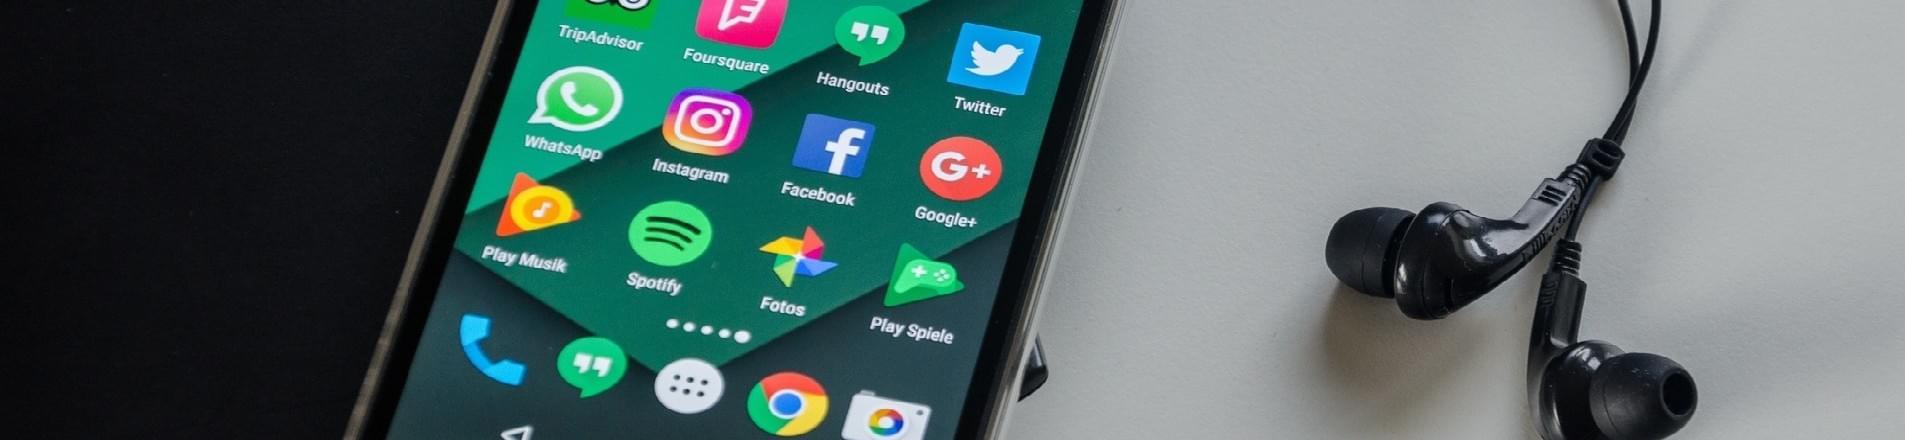 Social media - Does it create envy?